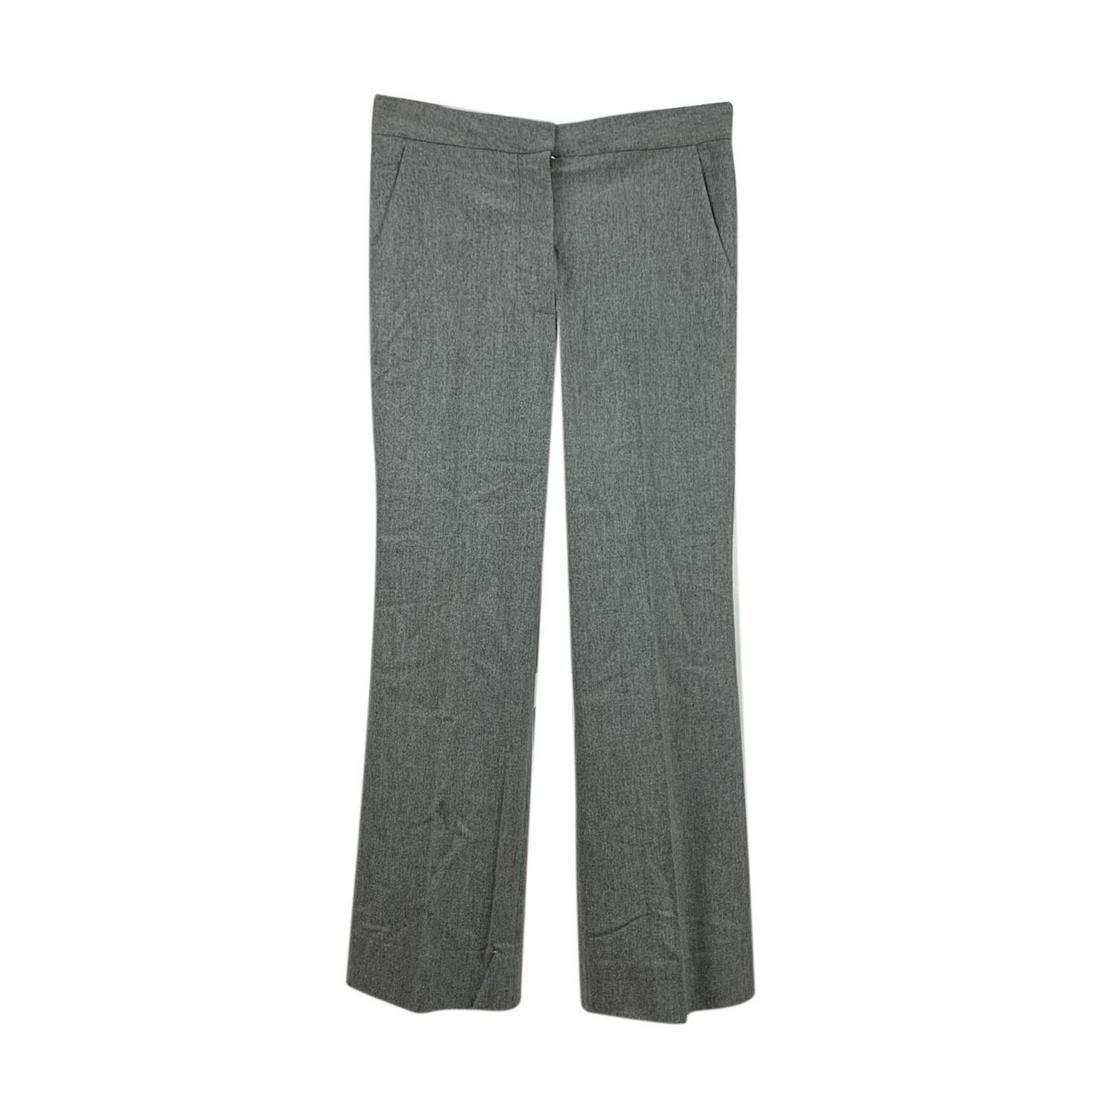 Stella McCartney Grey Wool Cashmere Trousers Size 40 IT